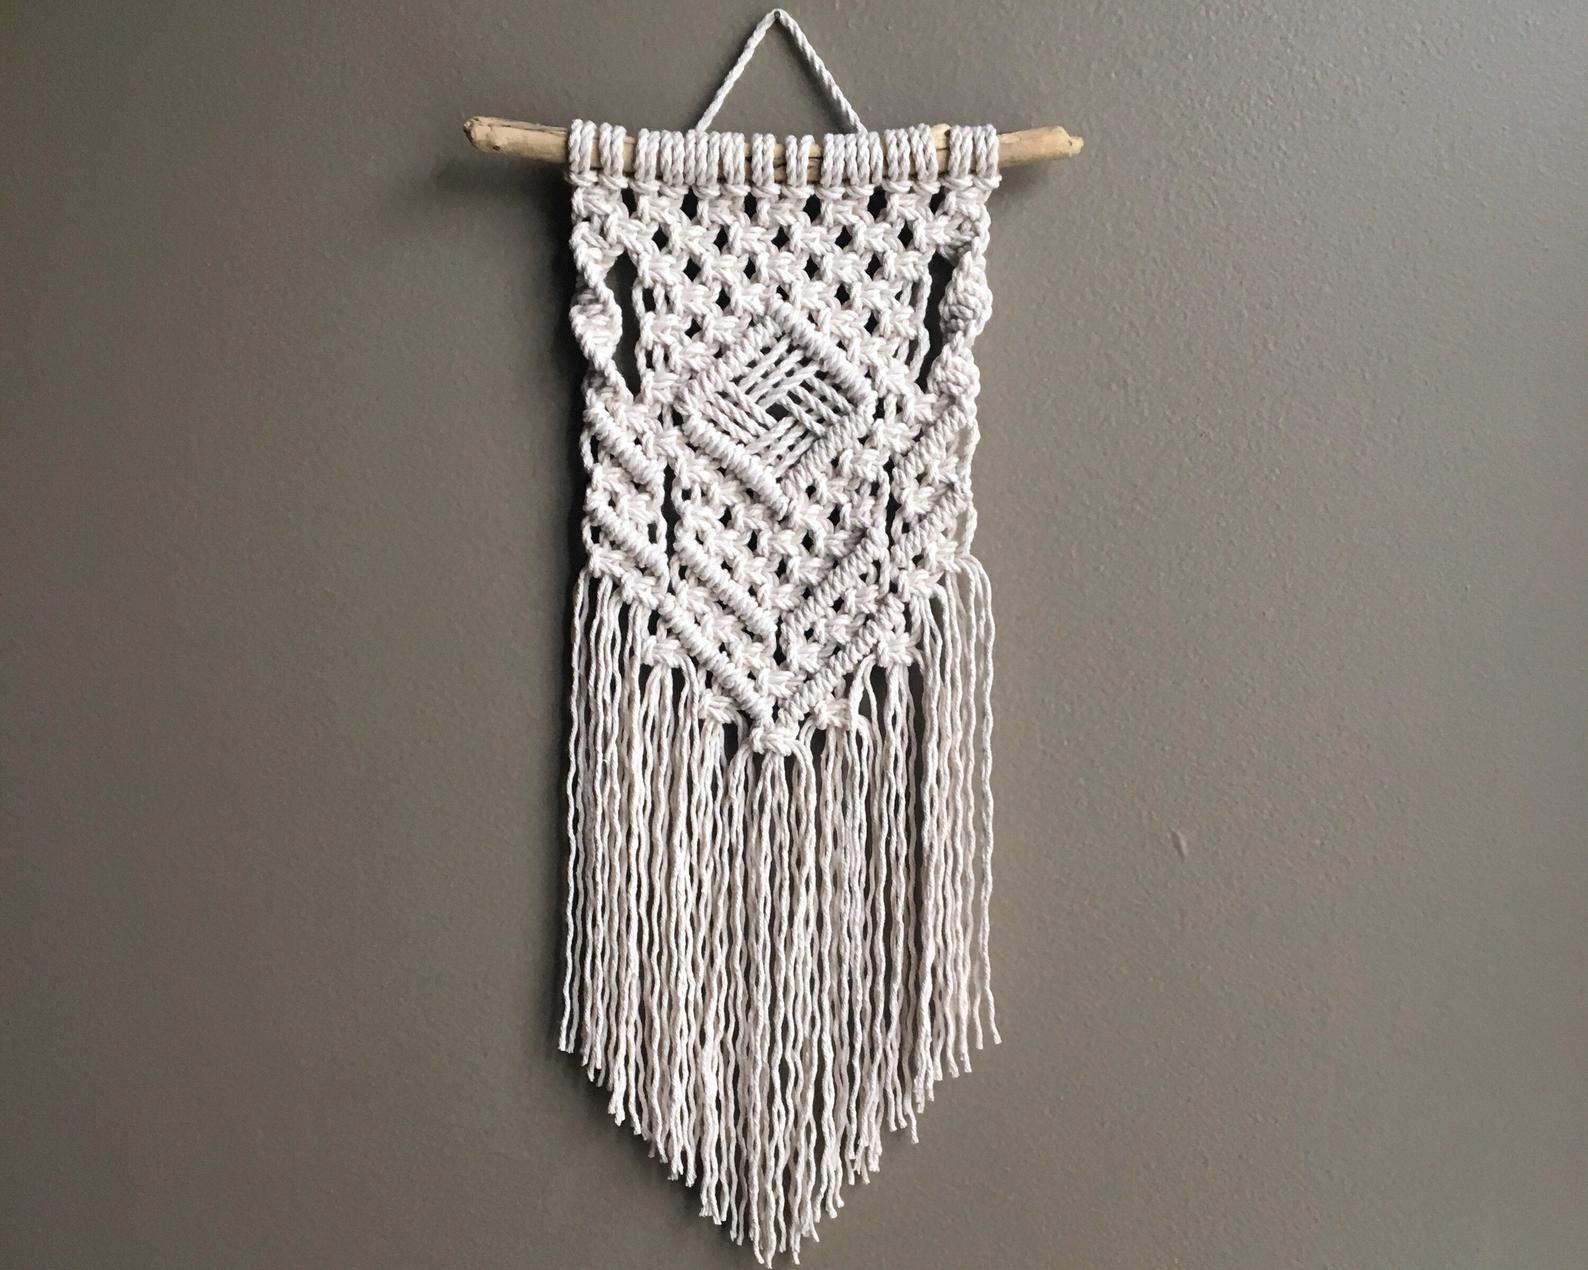 Diamond wall hanging